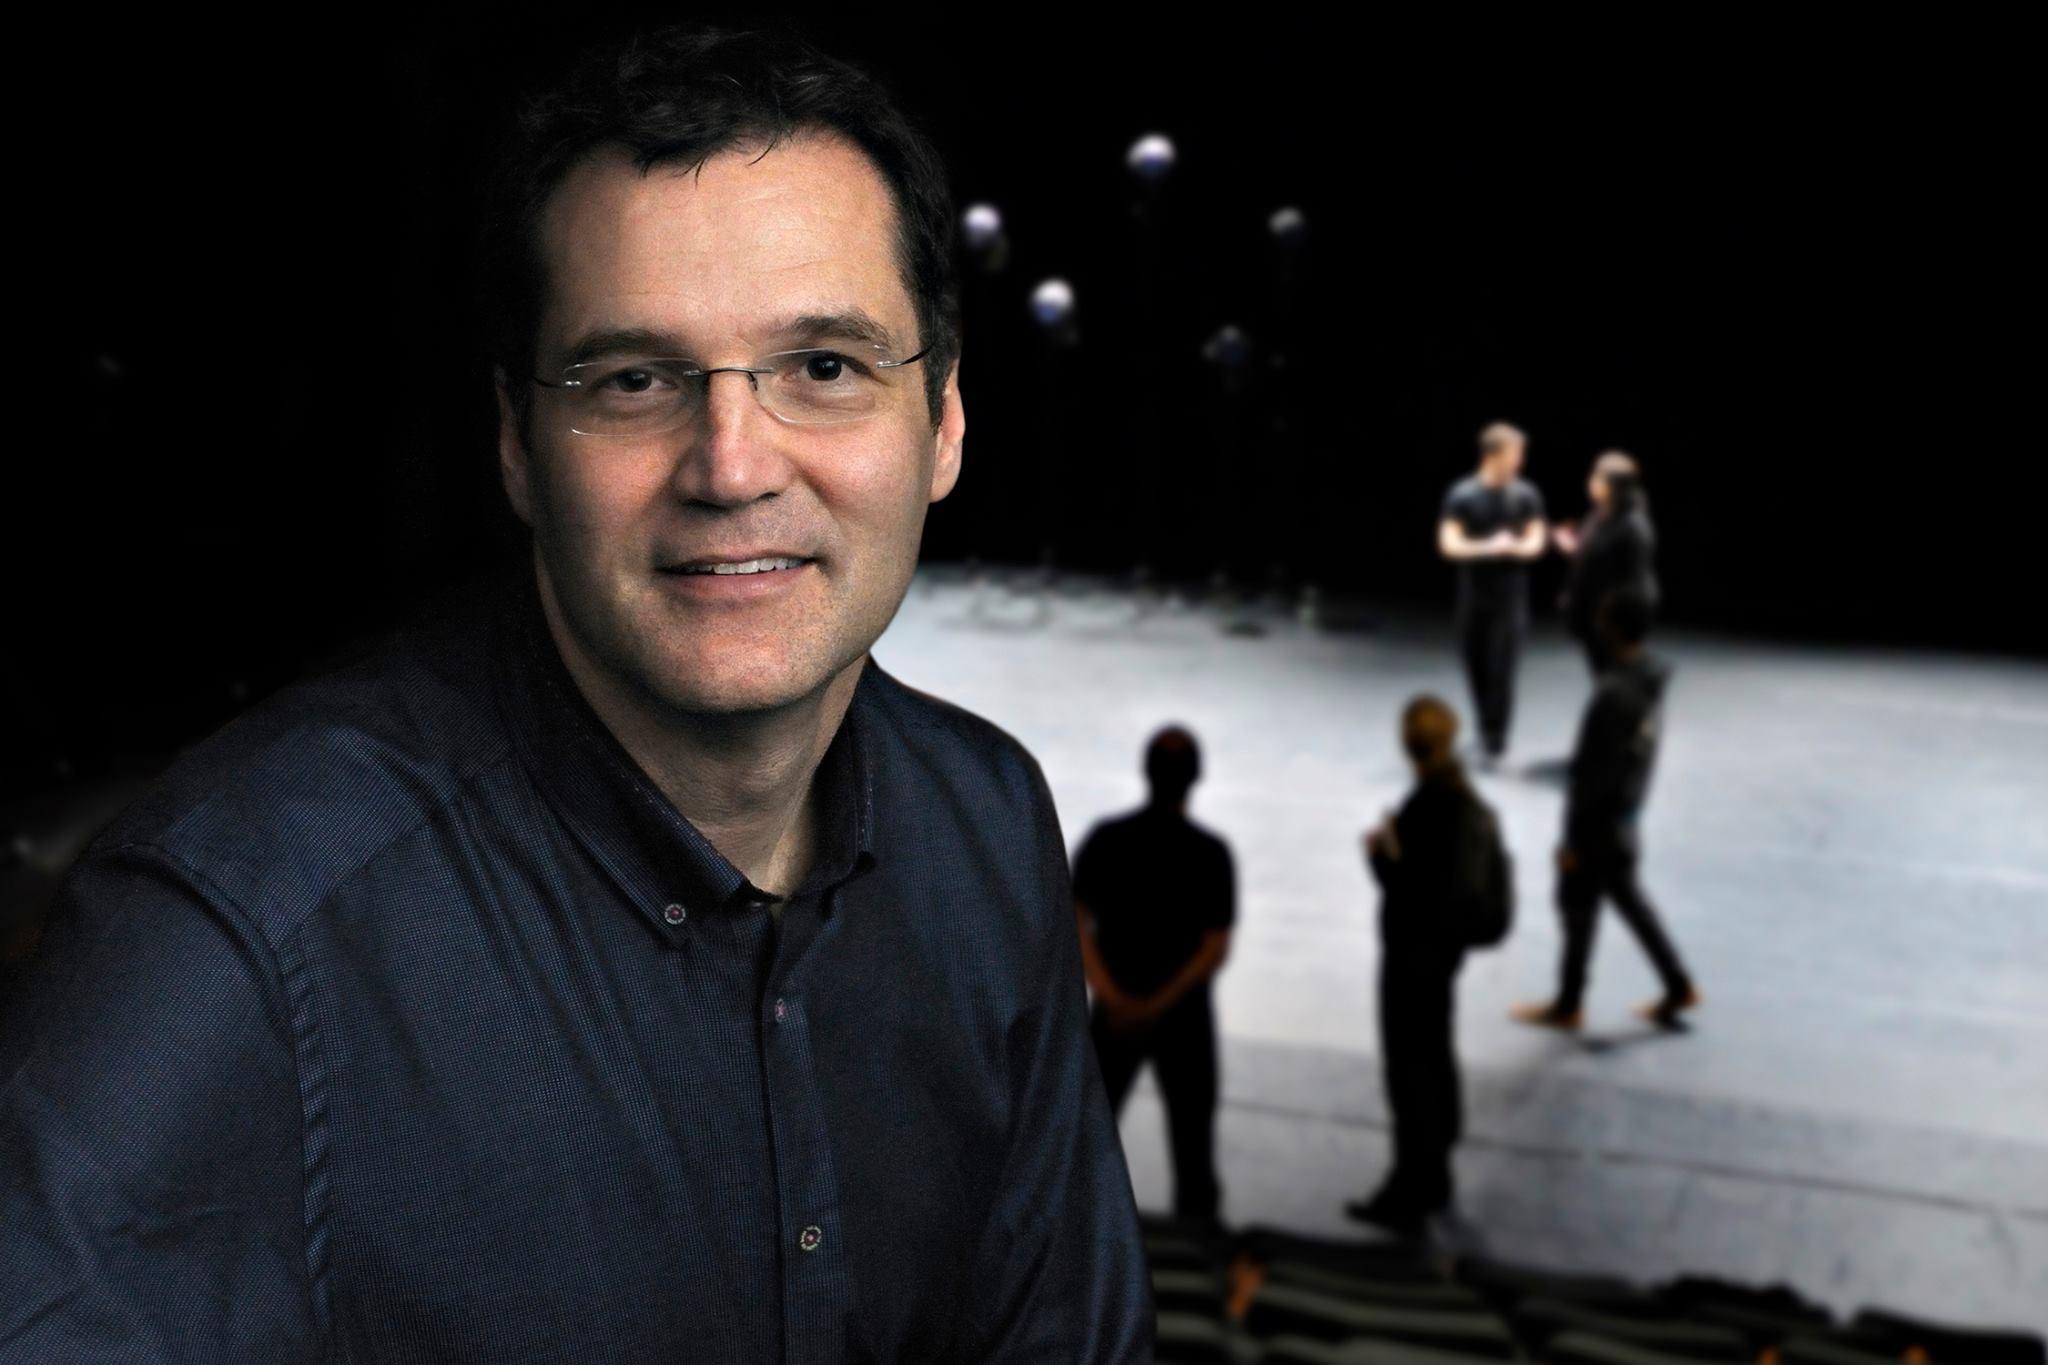 Brent Belsher, Director